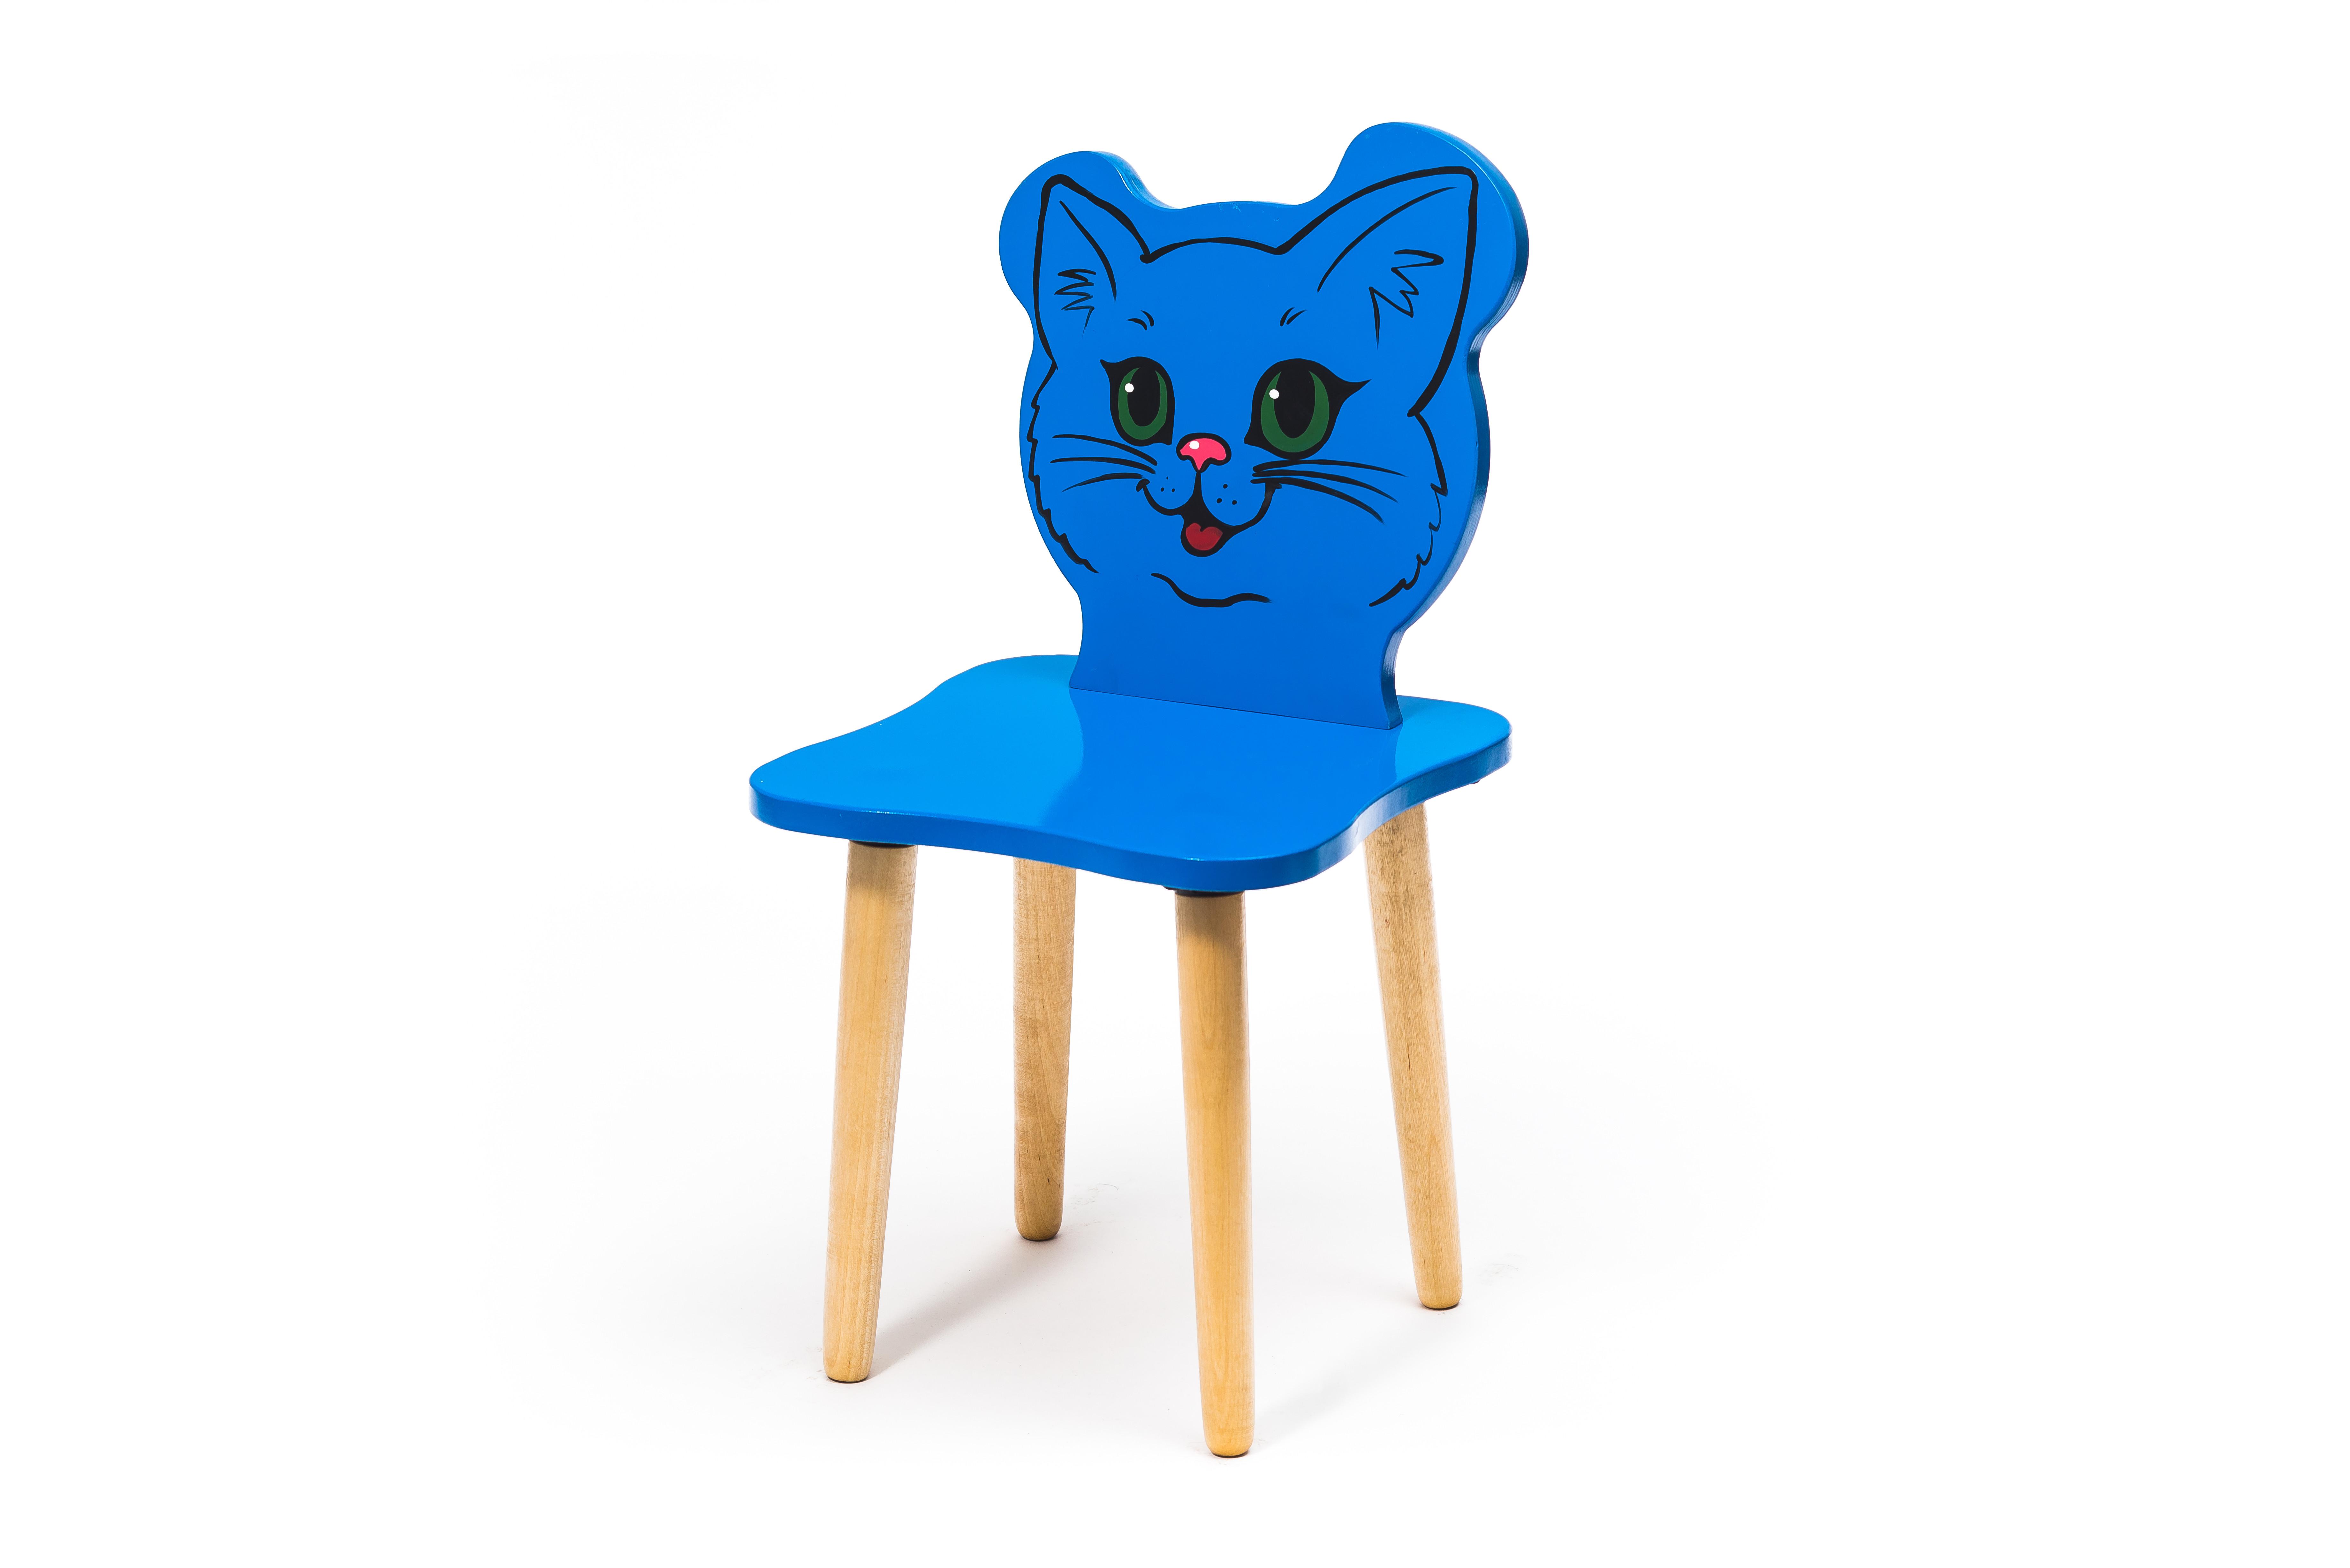 Столы и стулья Polli Tolli Джери. Киса композиция моя киса